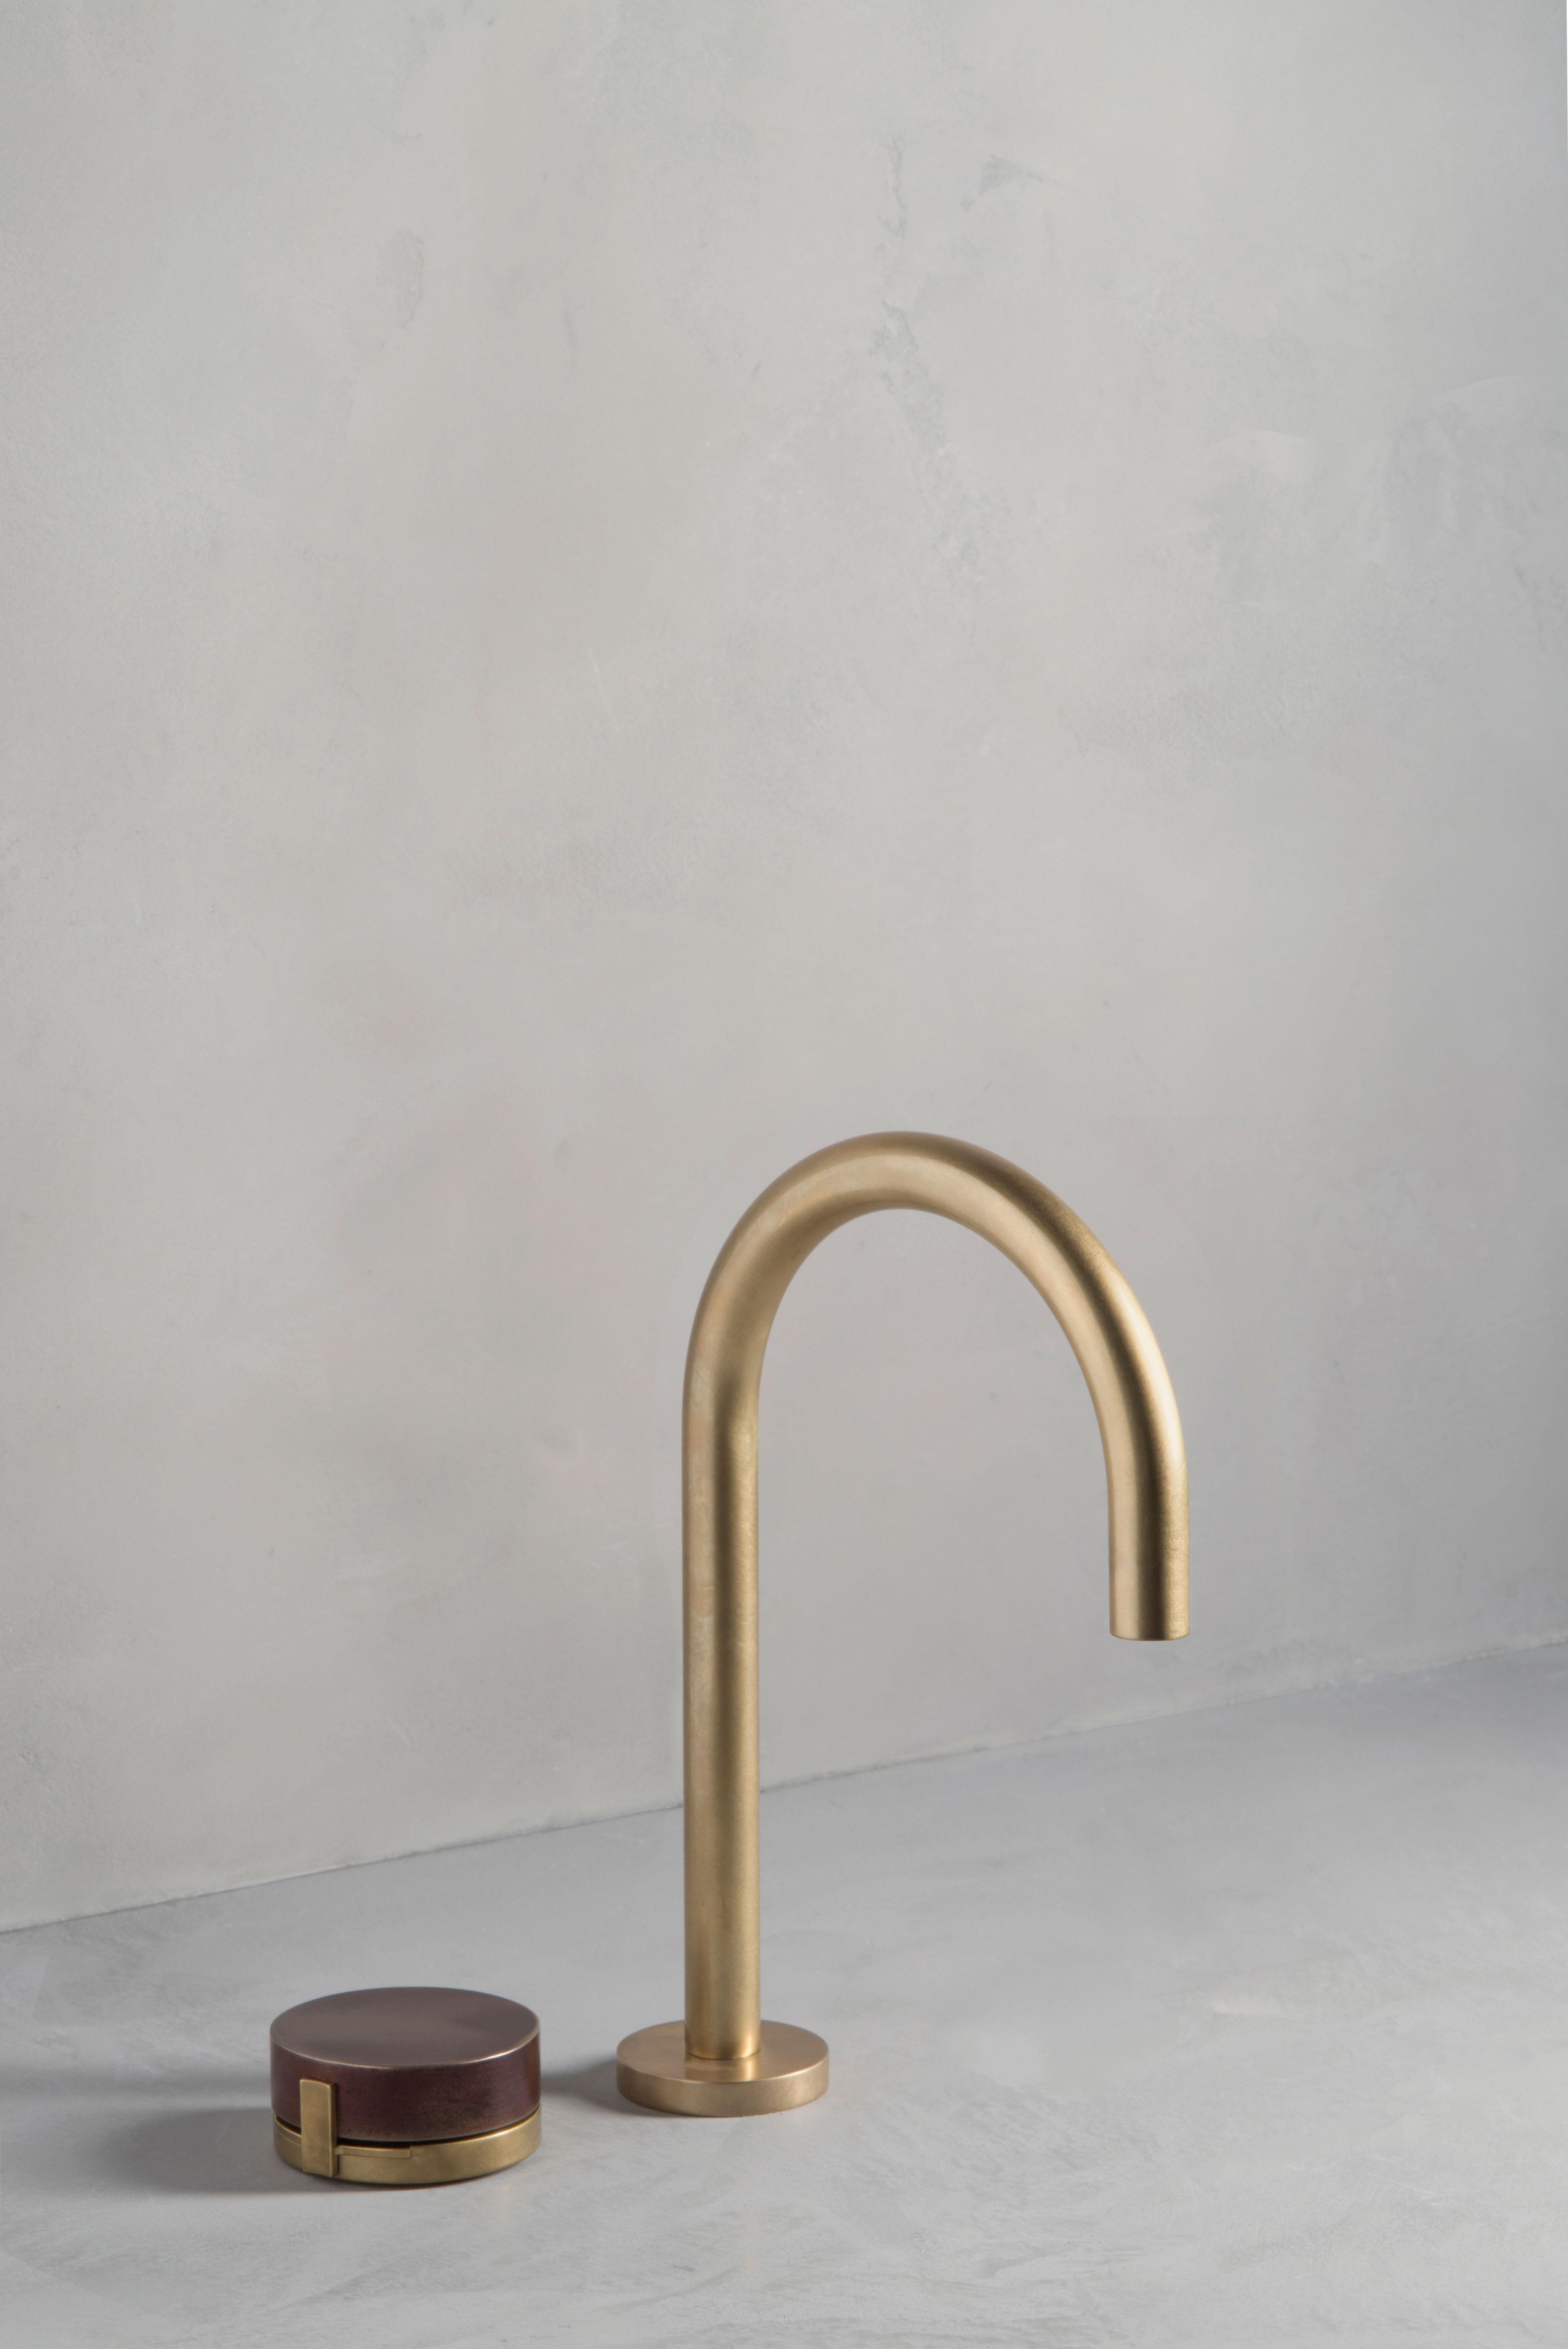 Watermark Designs\' New Elements Bath Fixture Collection Redefines ...